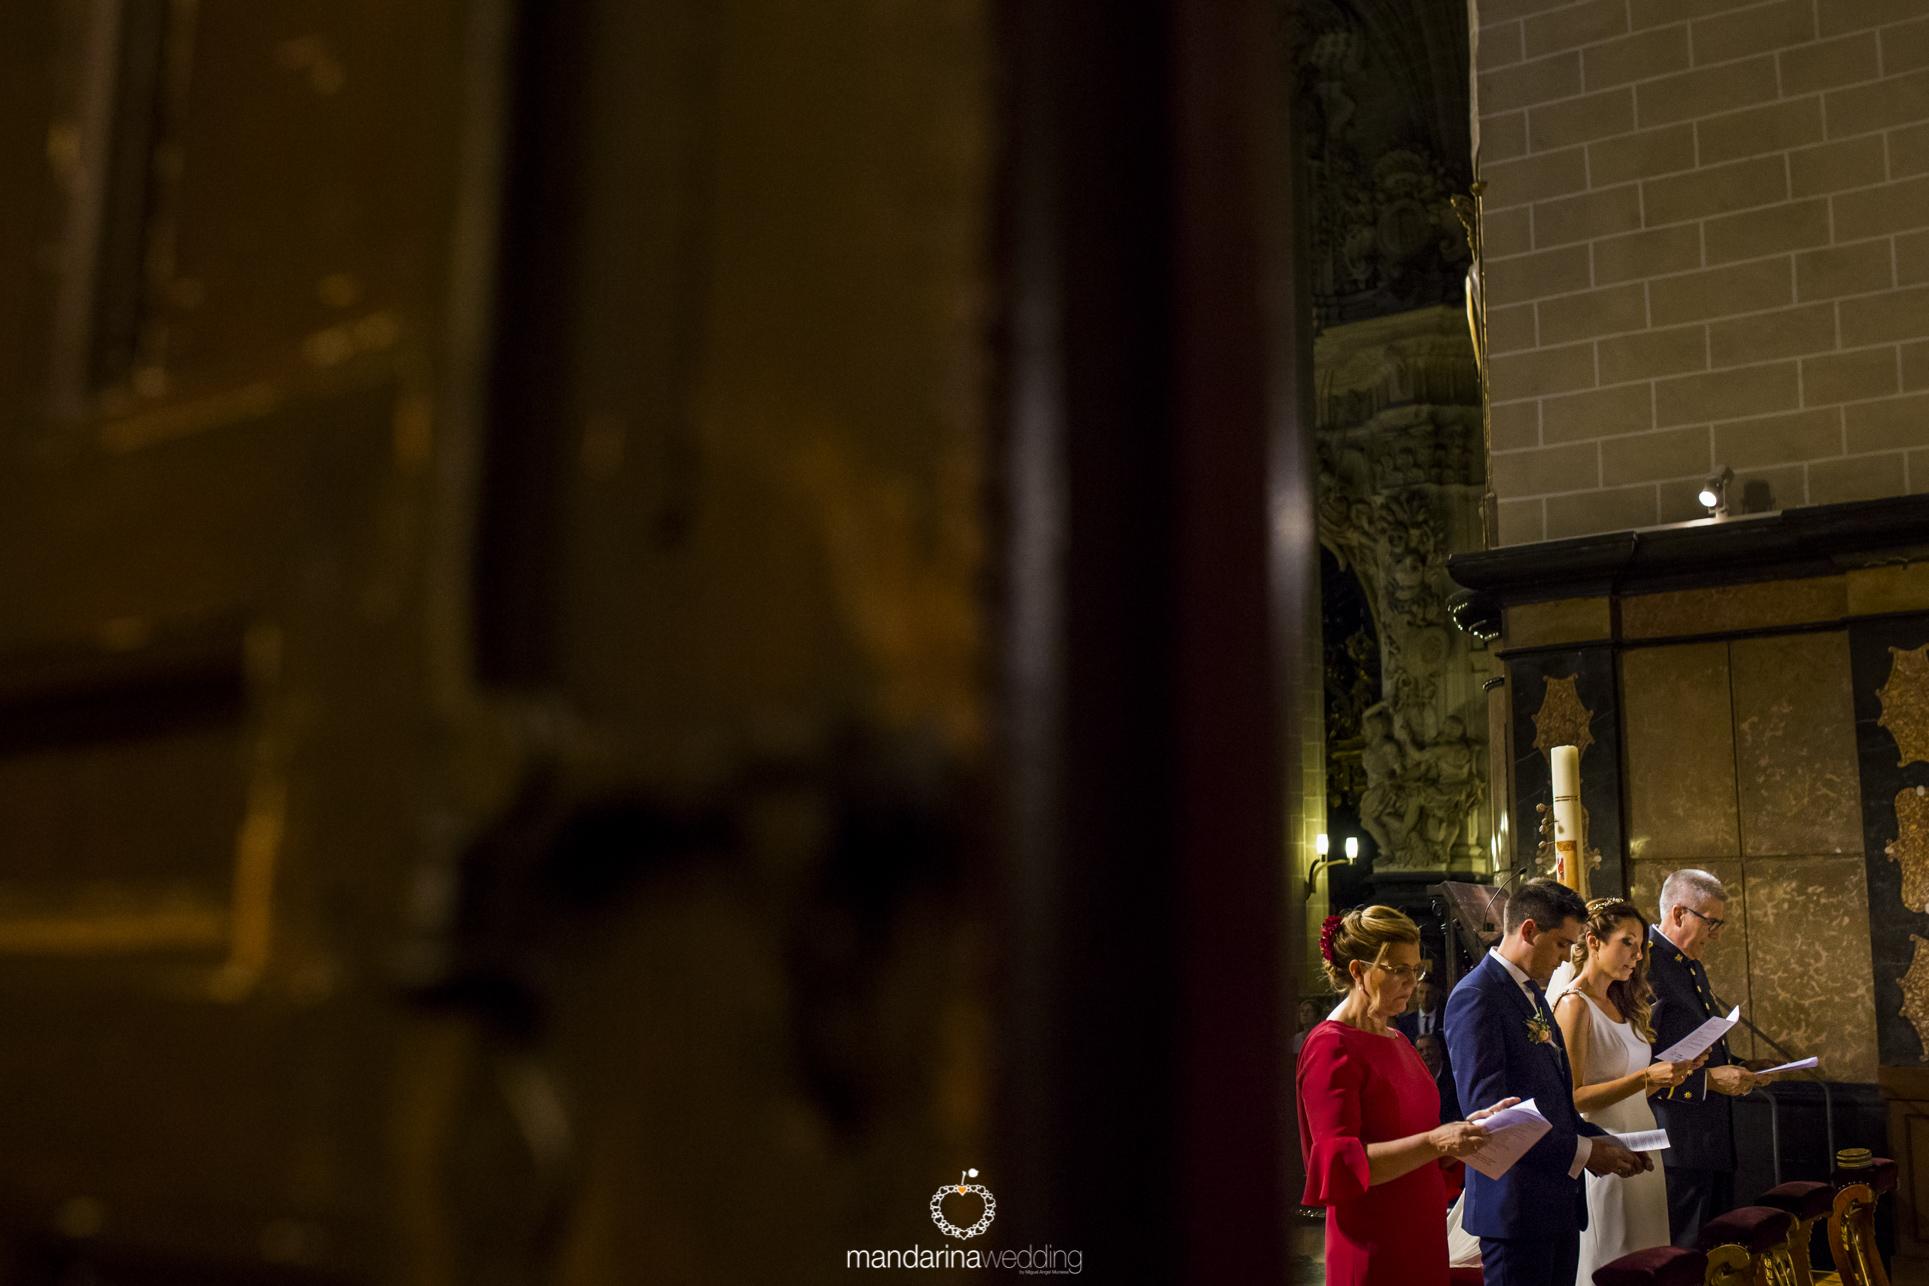 mandarina wedding, fotografo boda pais vasco, fotografo boda zaragoza, fotógrafo boda soria, fotografo boda Madrid, fotógrafo boda tarragona-05